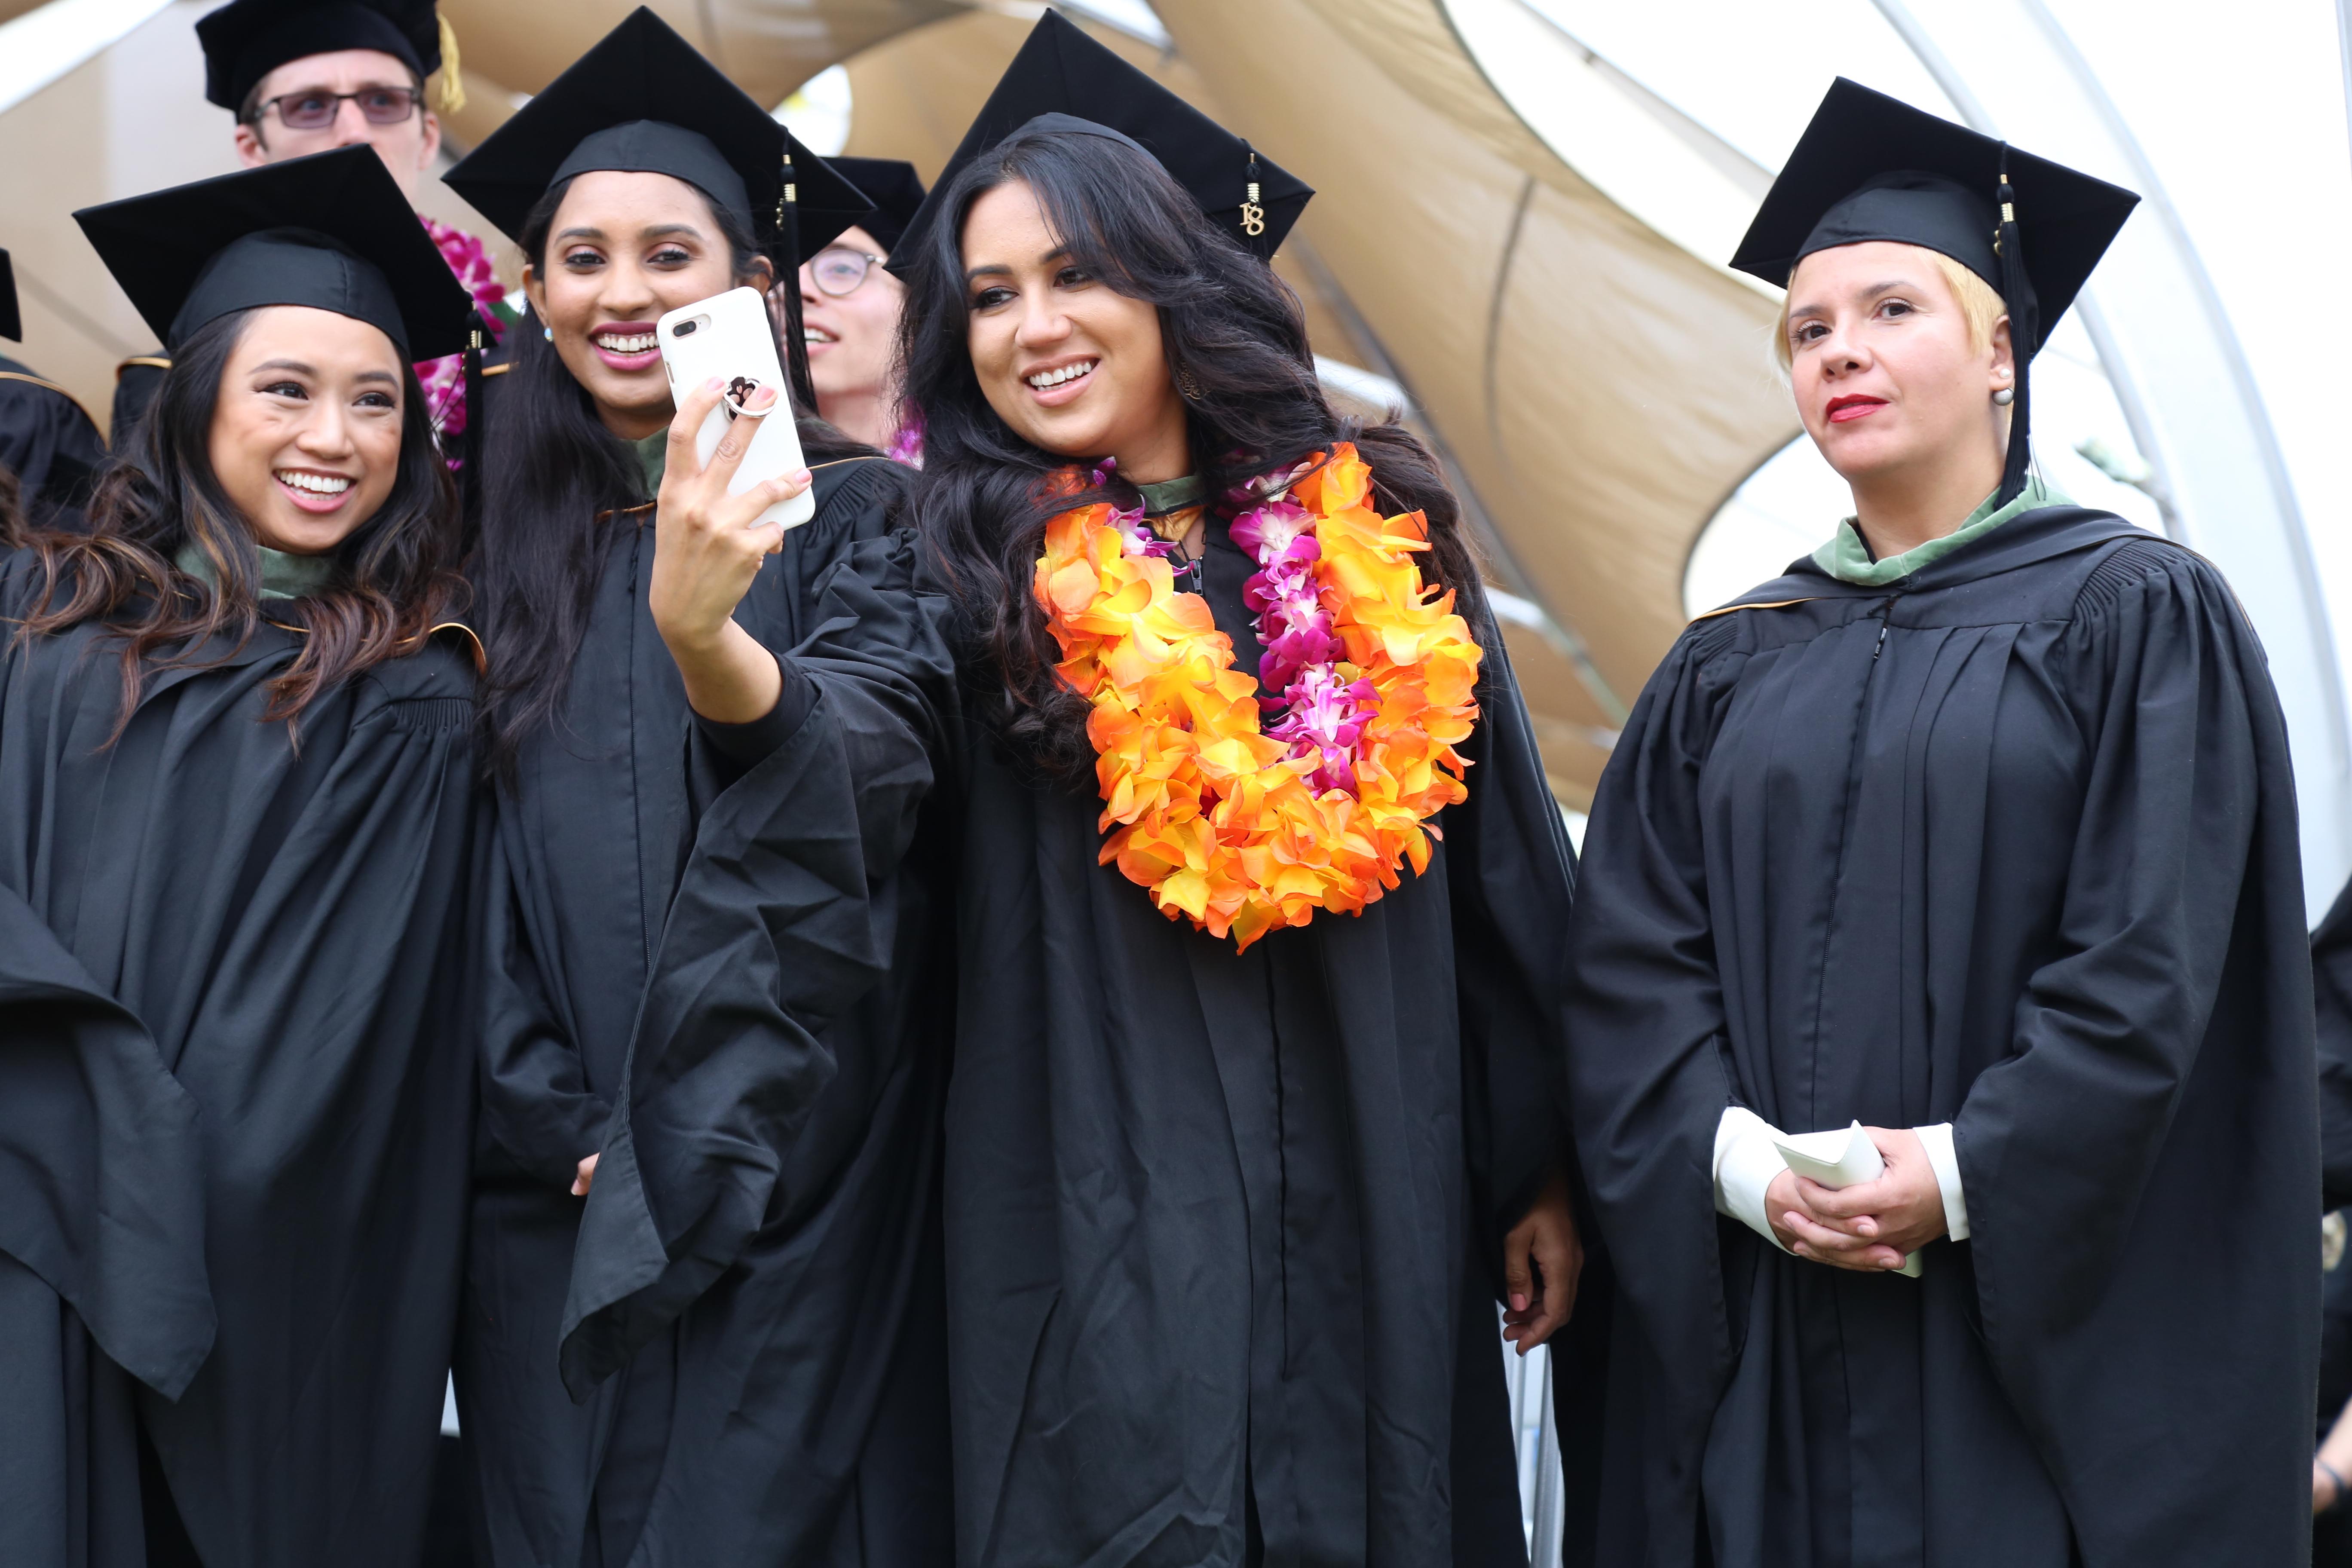 Second Pathologists' Assistant class graduates from School